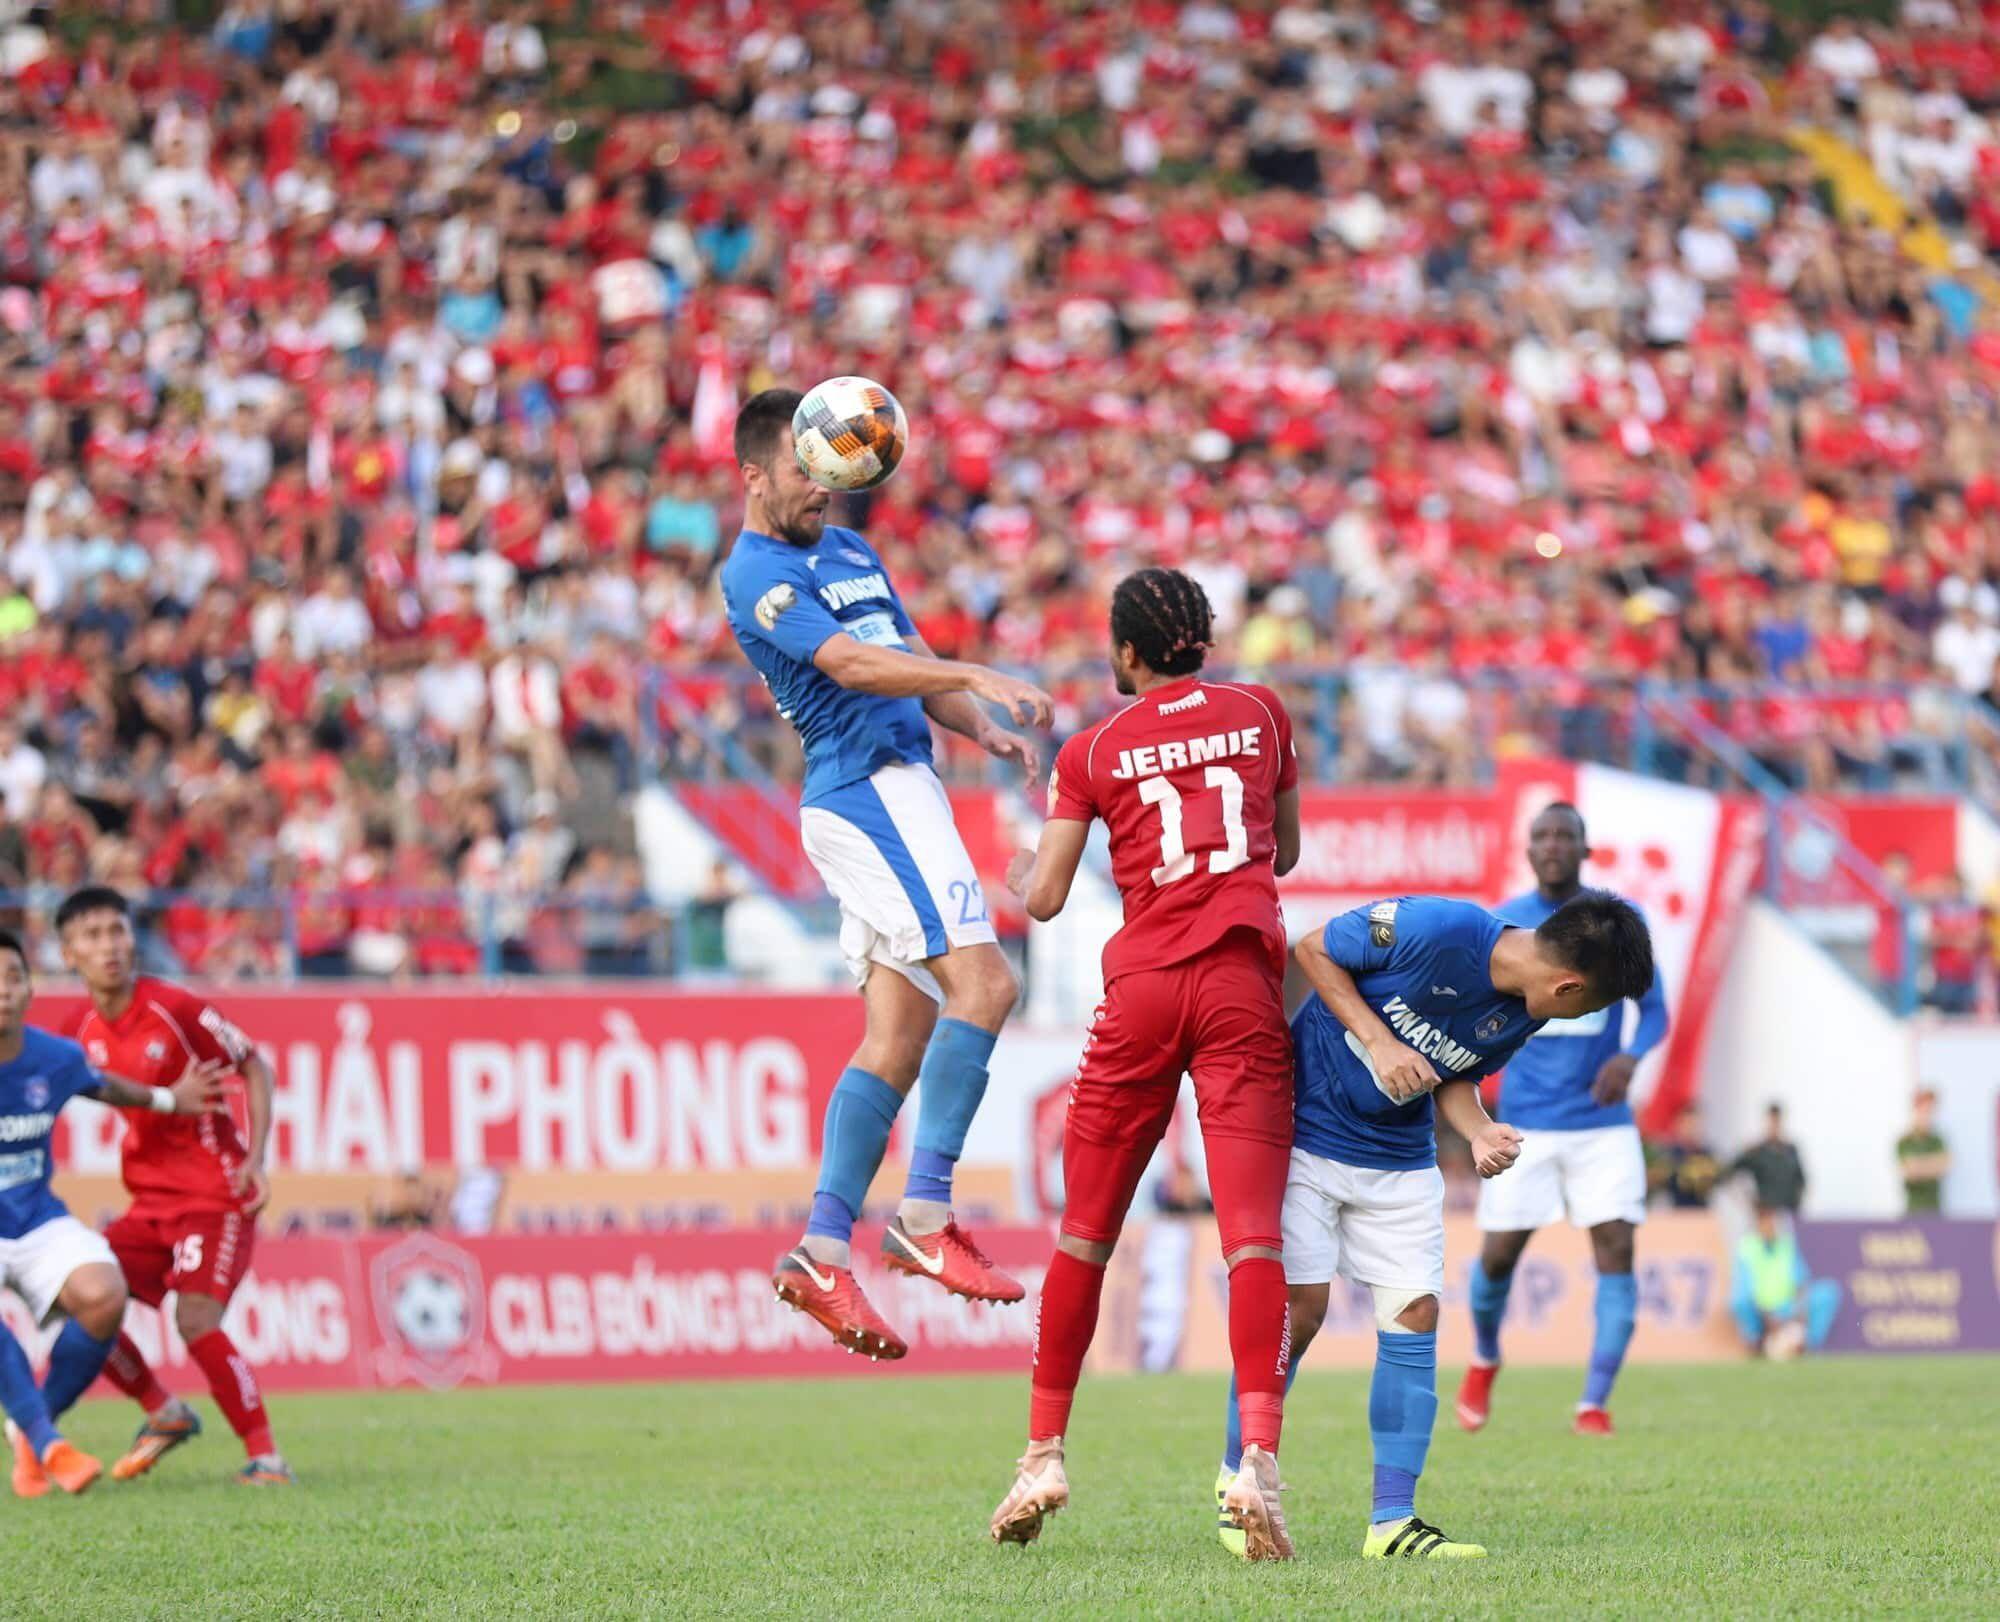 vi sao v league khong doi lich de tuyen viet nam da vong loai world cup